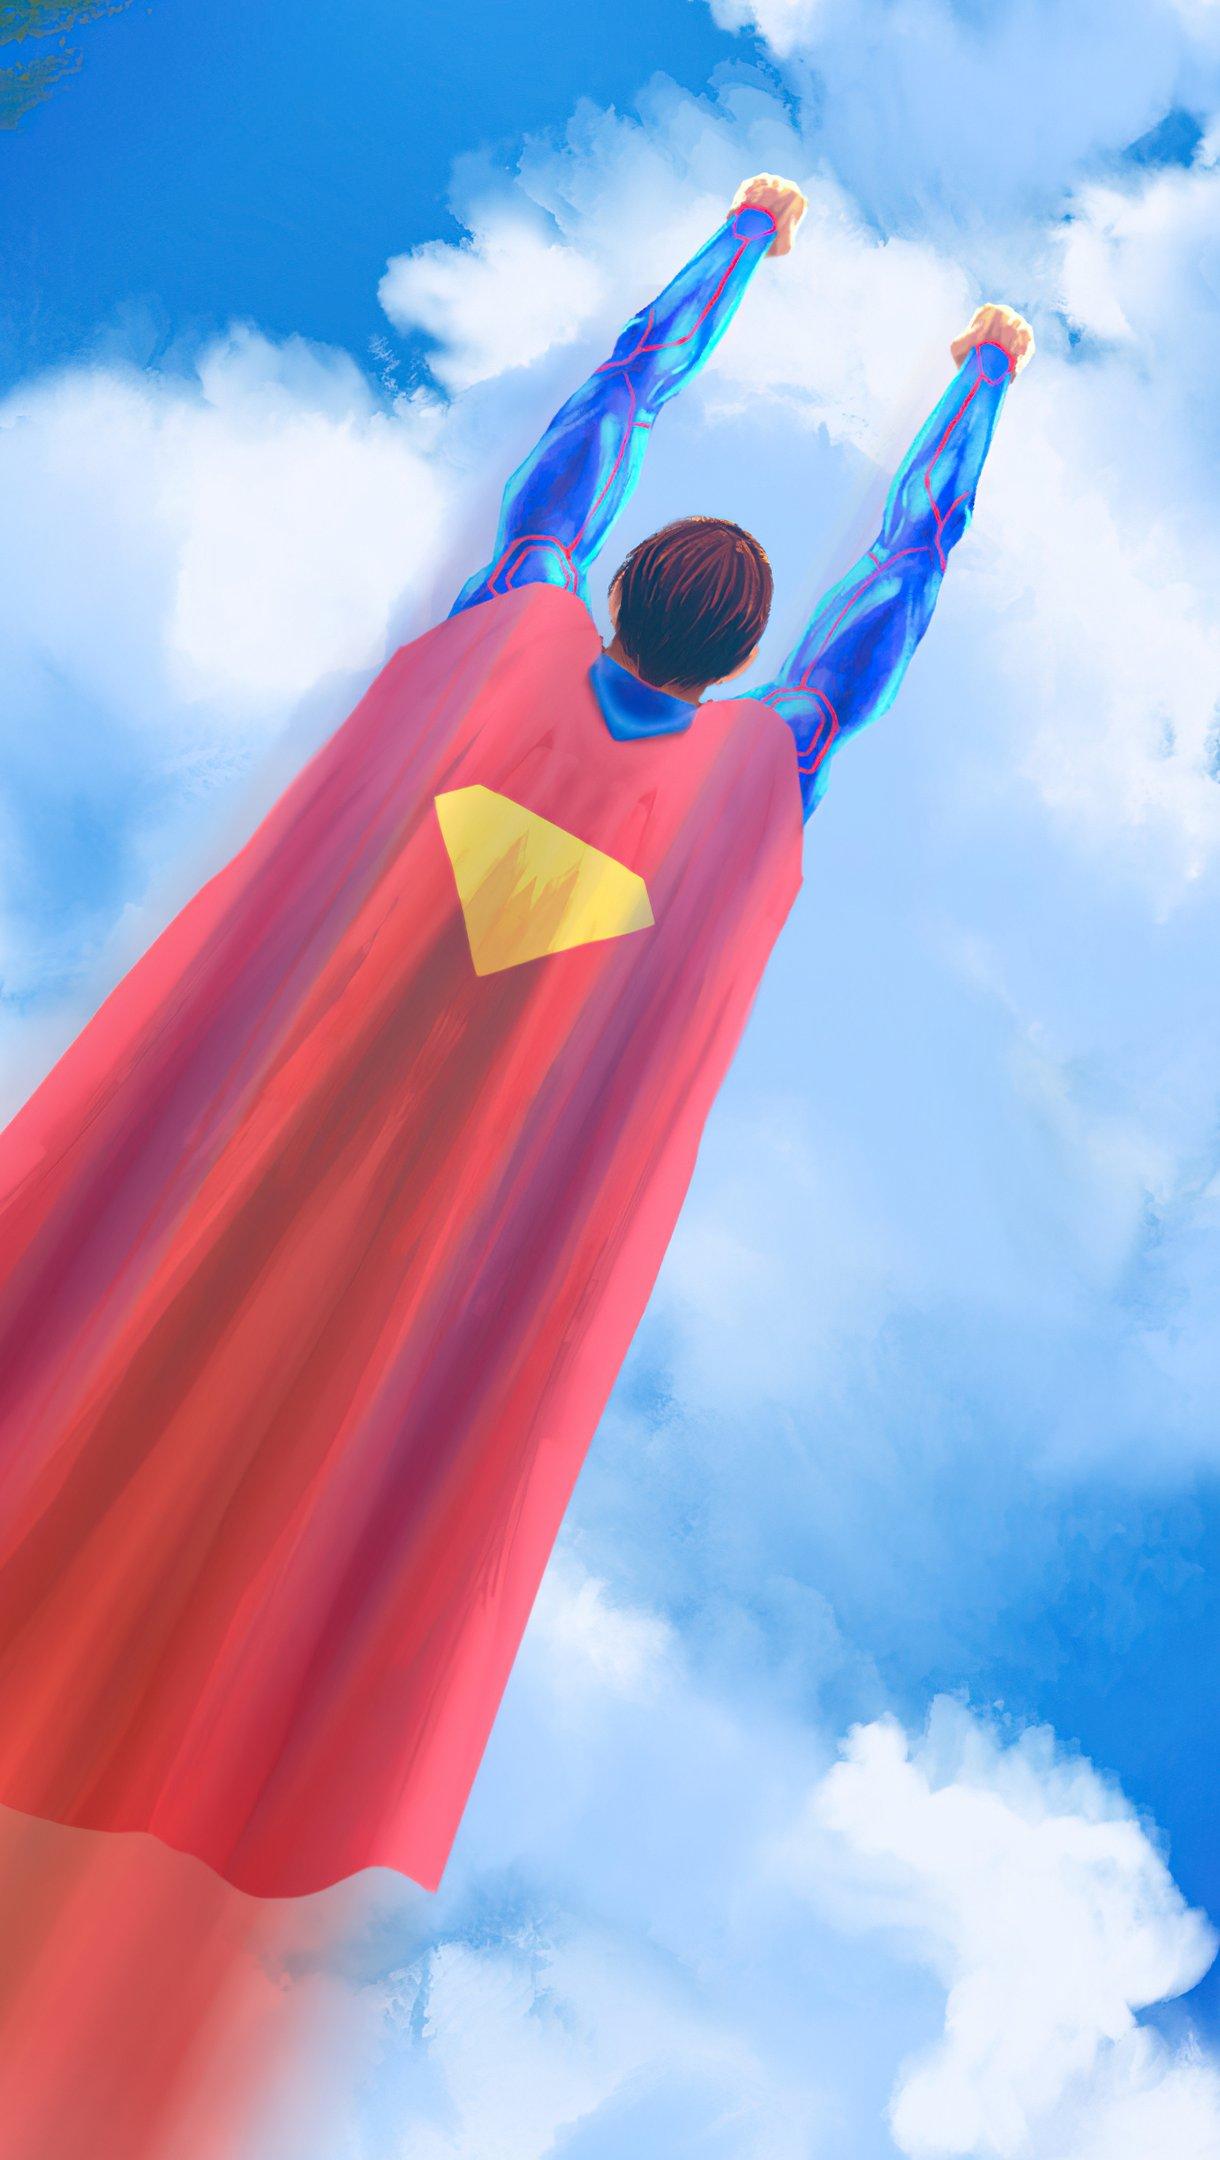 Wallpaper Superman flying Digital Art Vertical